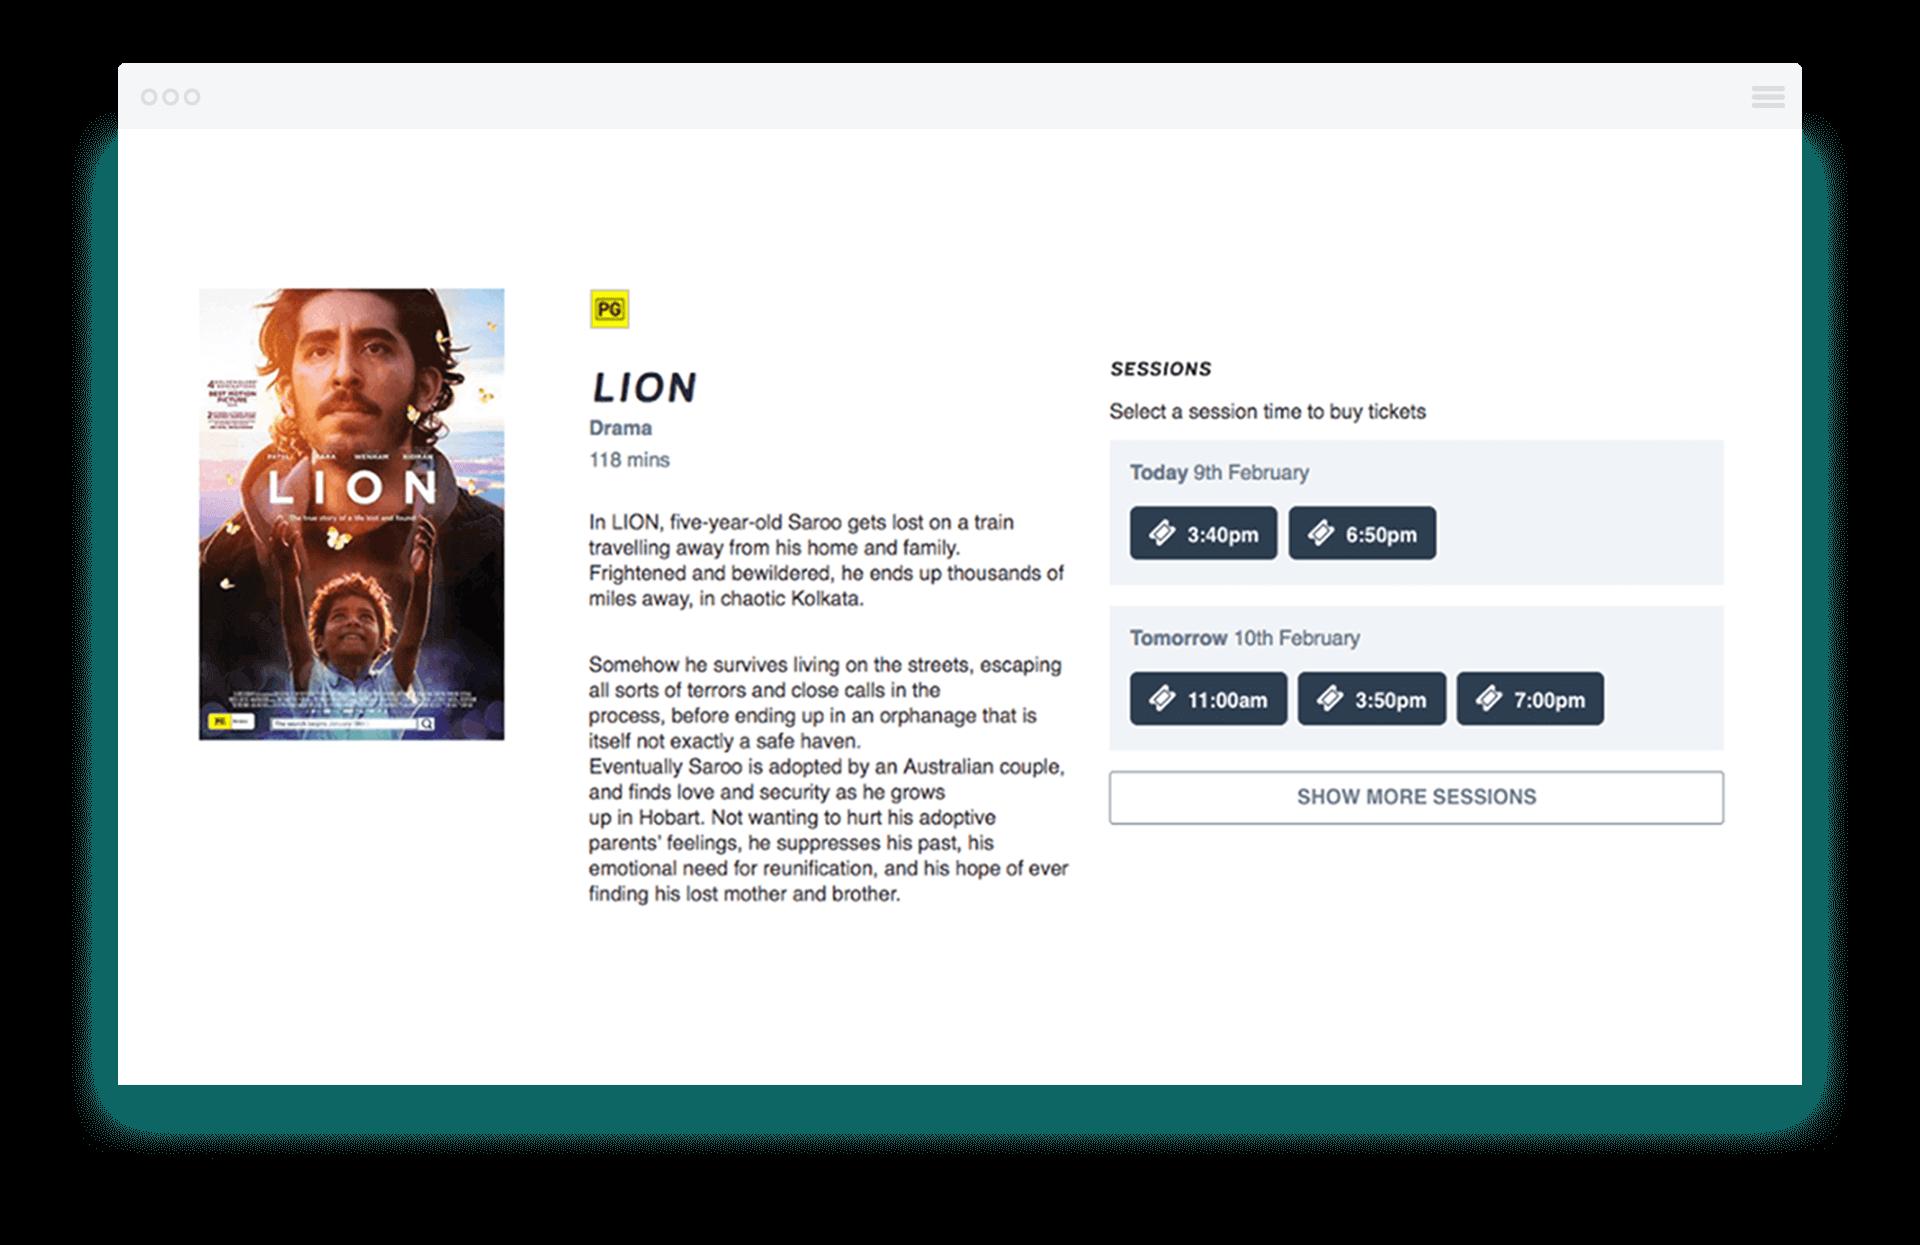 Cinema Information Example